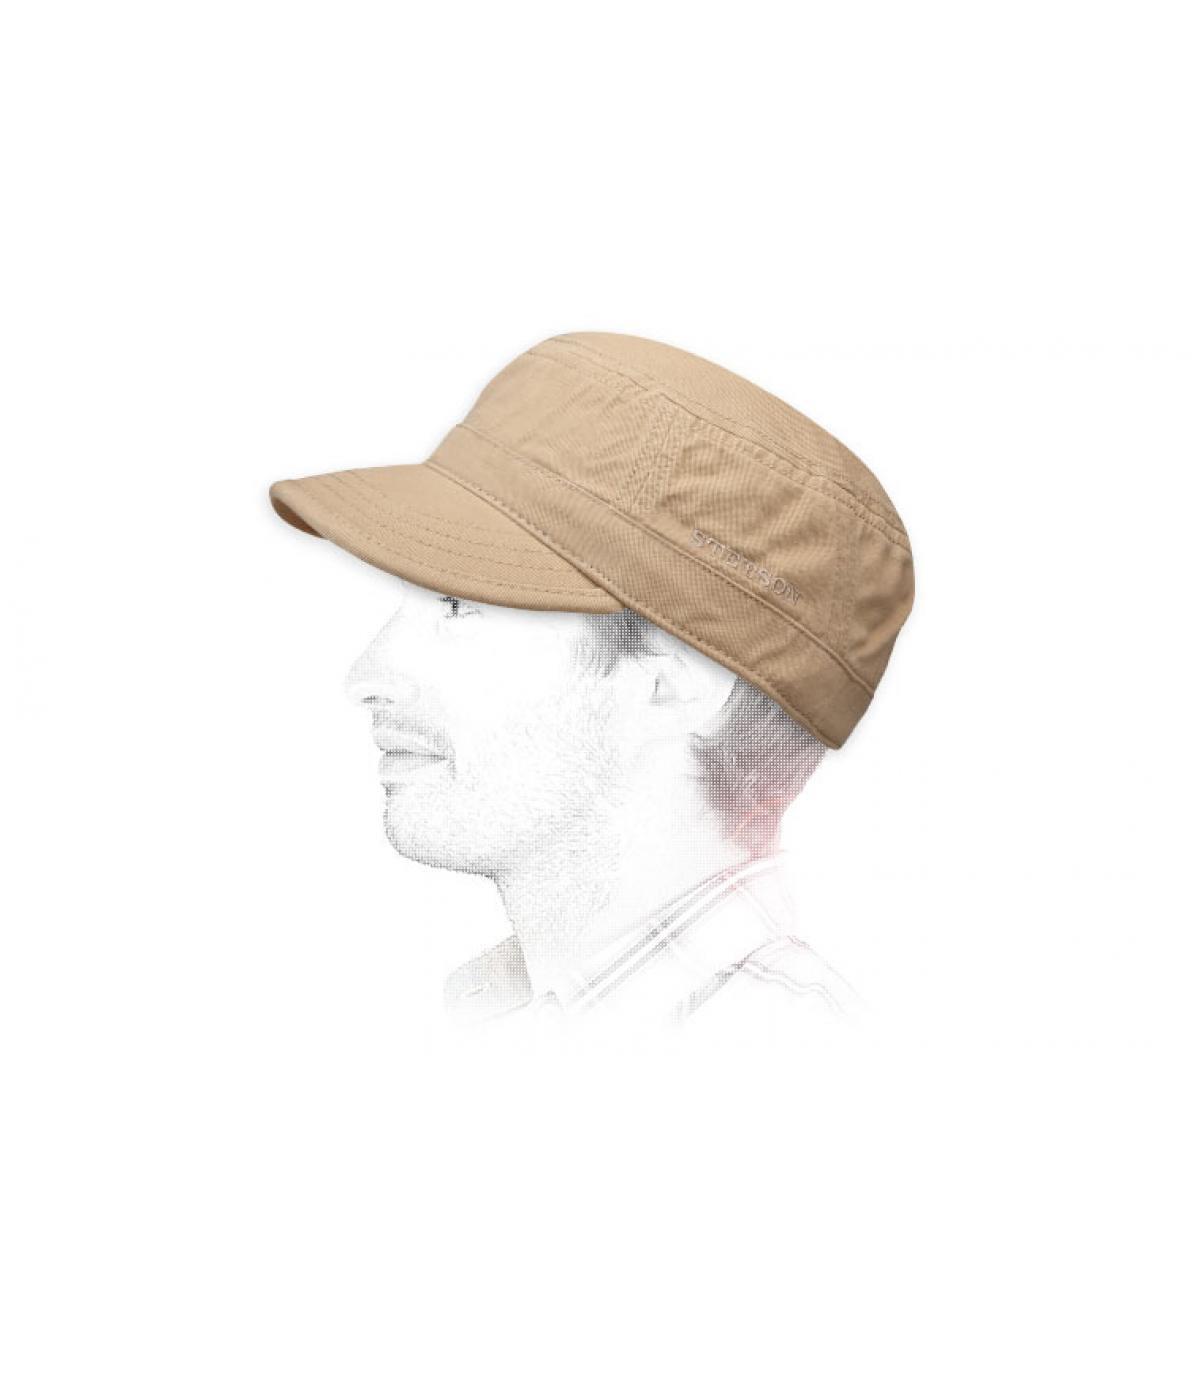 Basic beige army cap